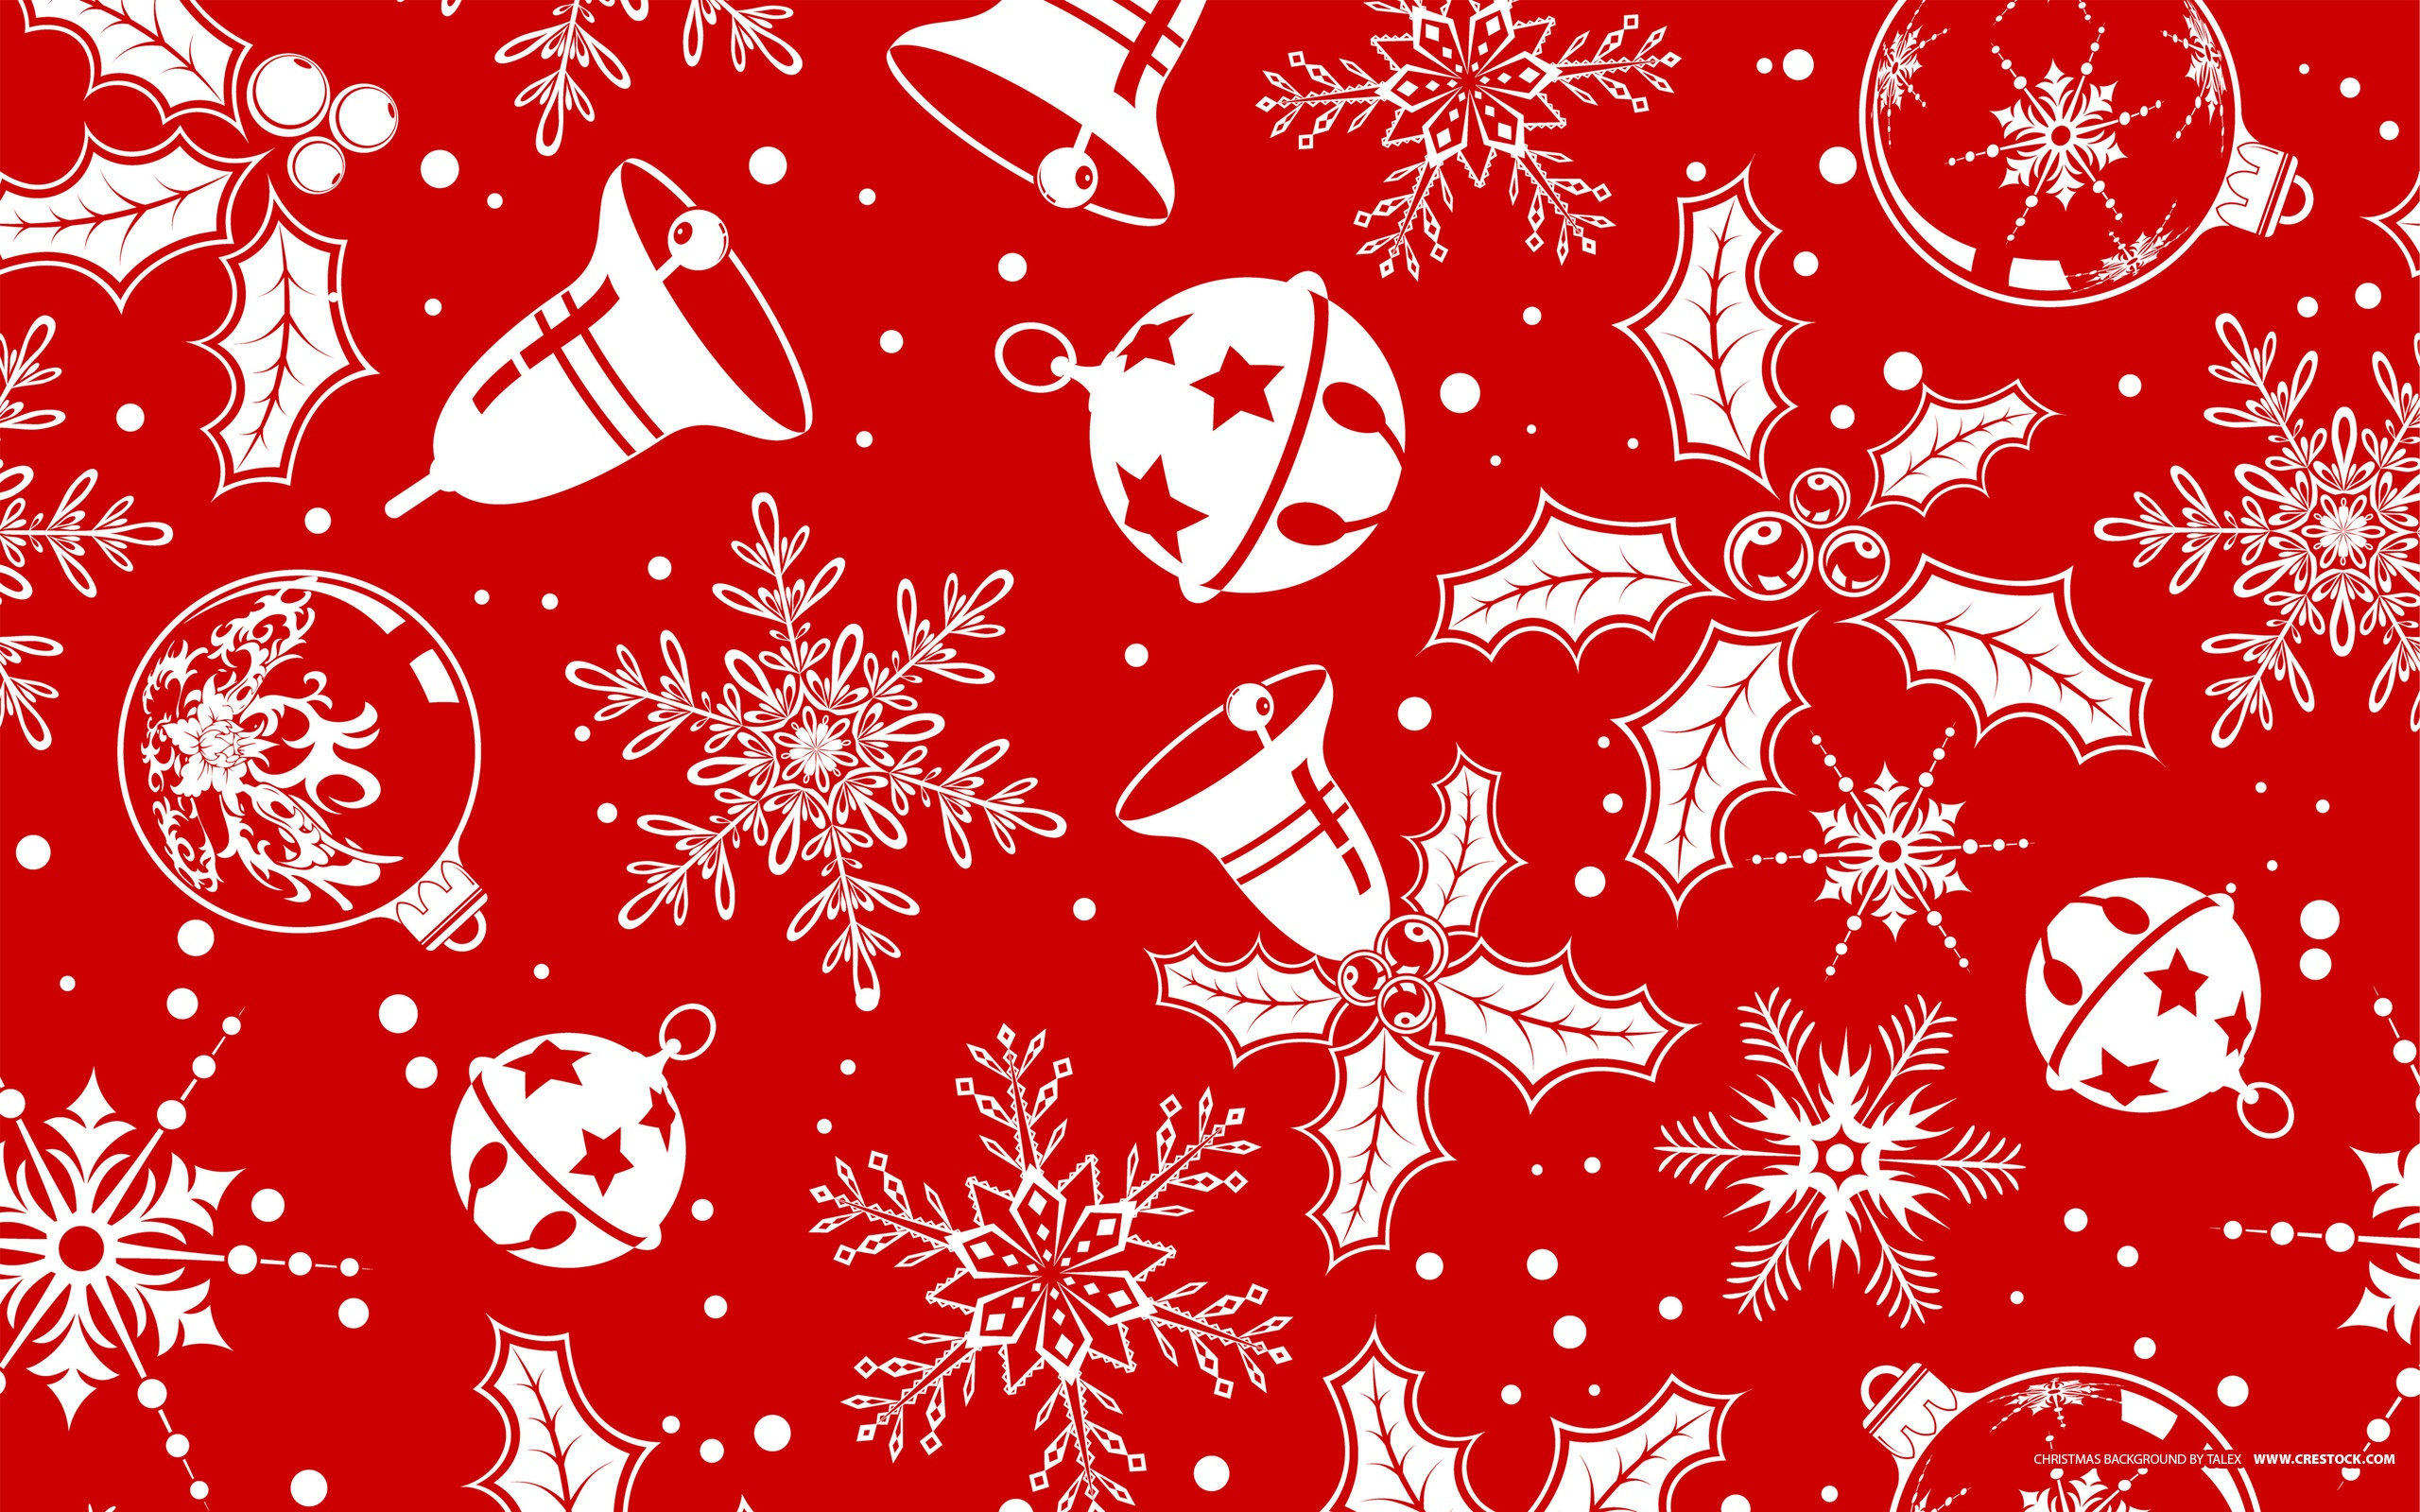 Christmas In Europe Wallpaper.Georgian Youth For Europe Christmas Christmas Wallpaper